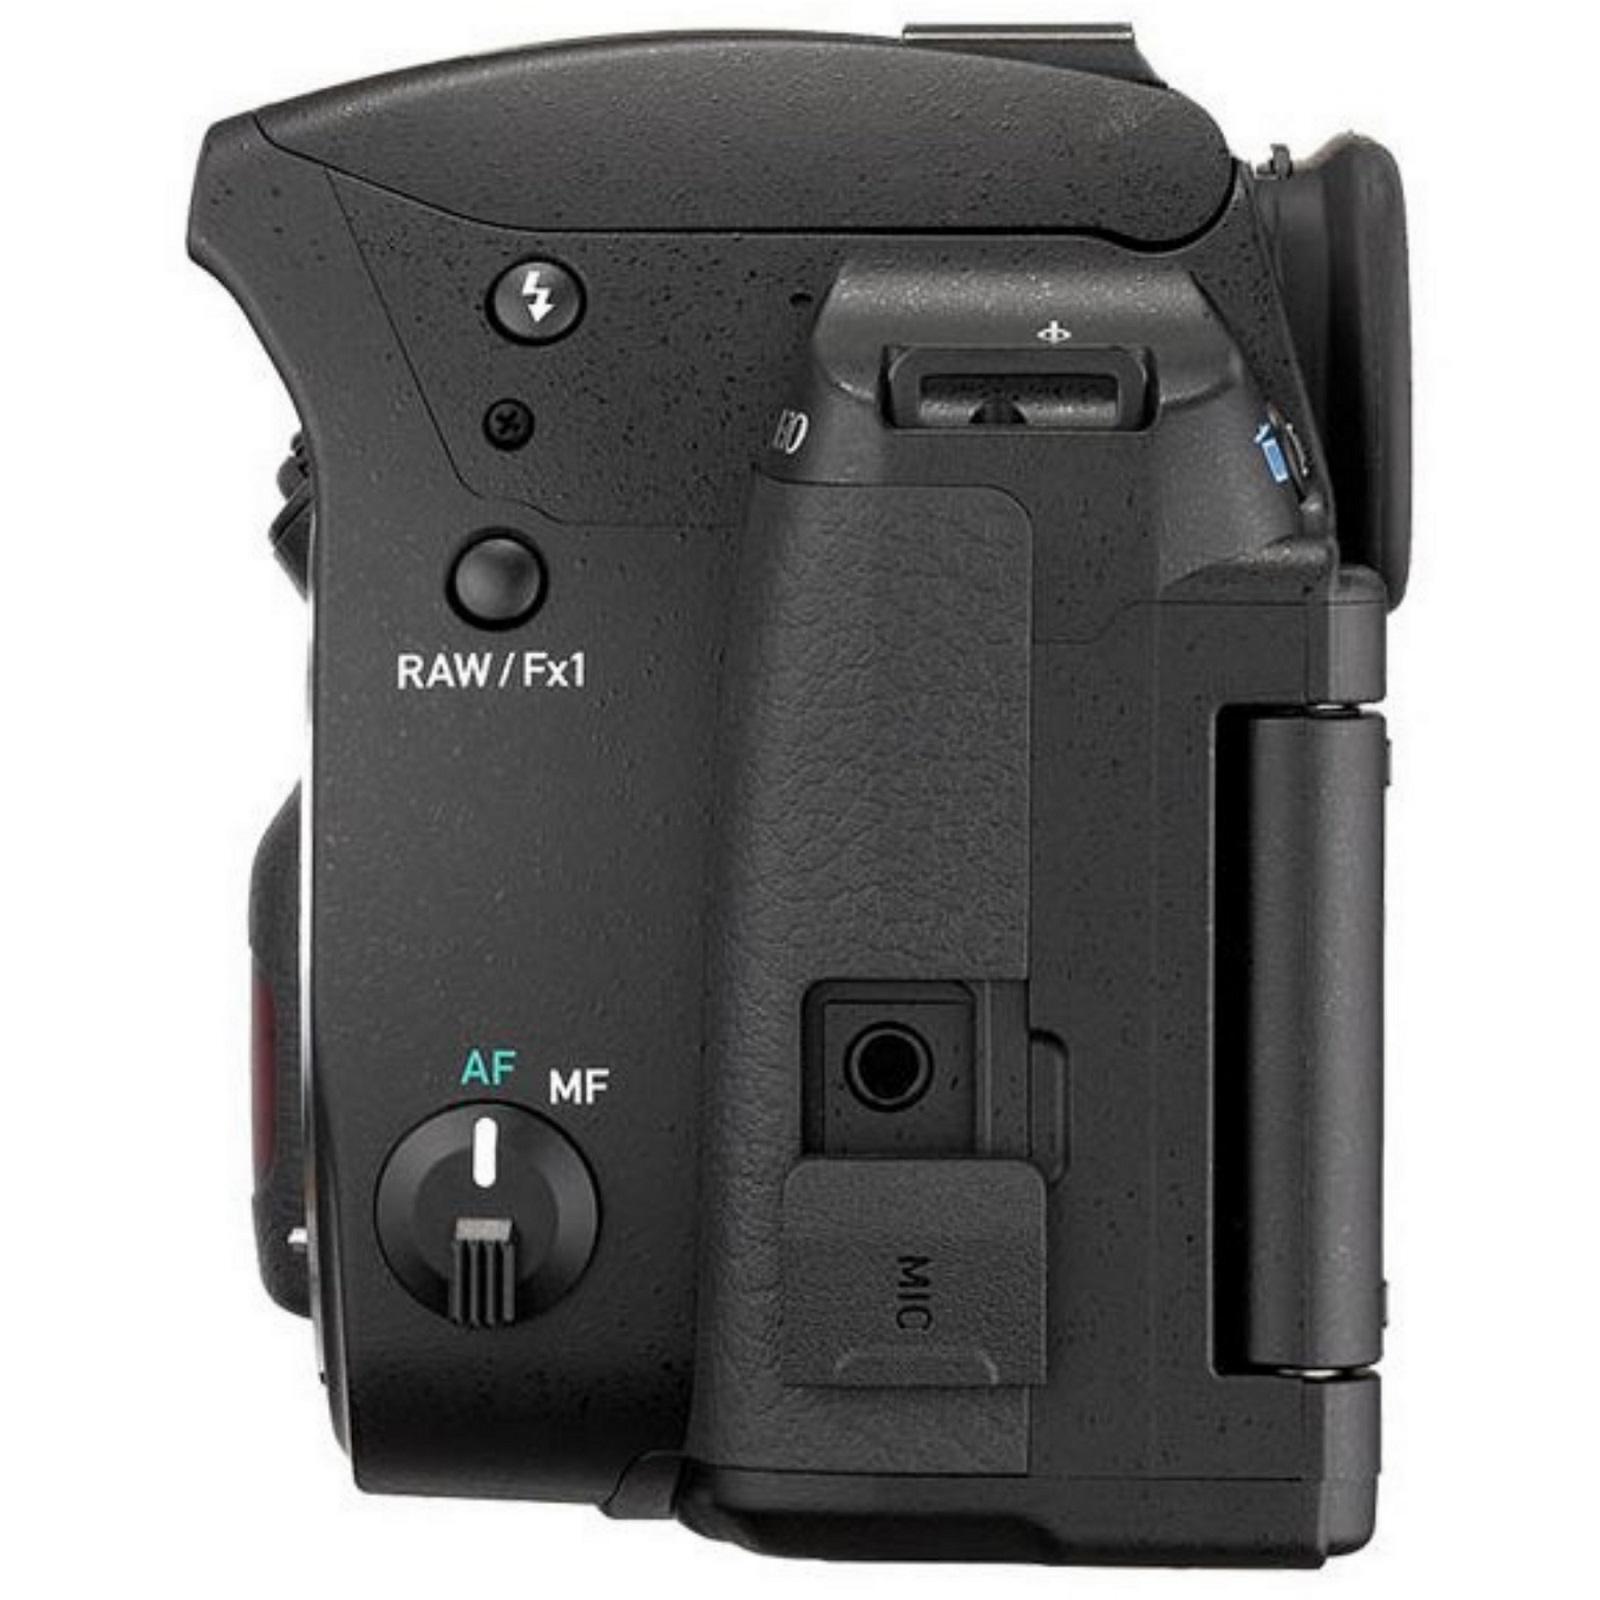 PENTAX ペンタックス デジタル一眼レフカメラ K-70 ボディ ブラック 新品